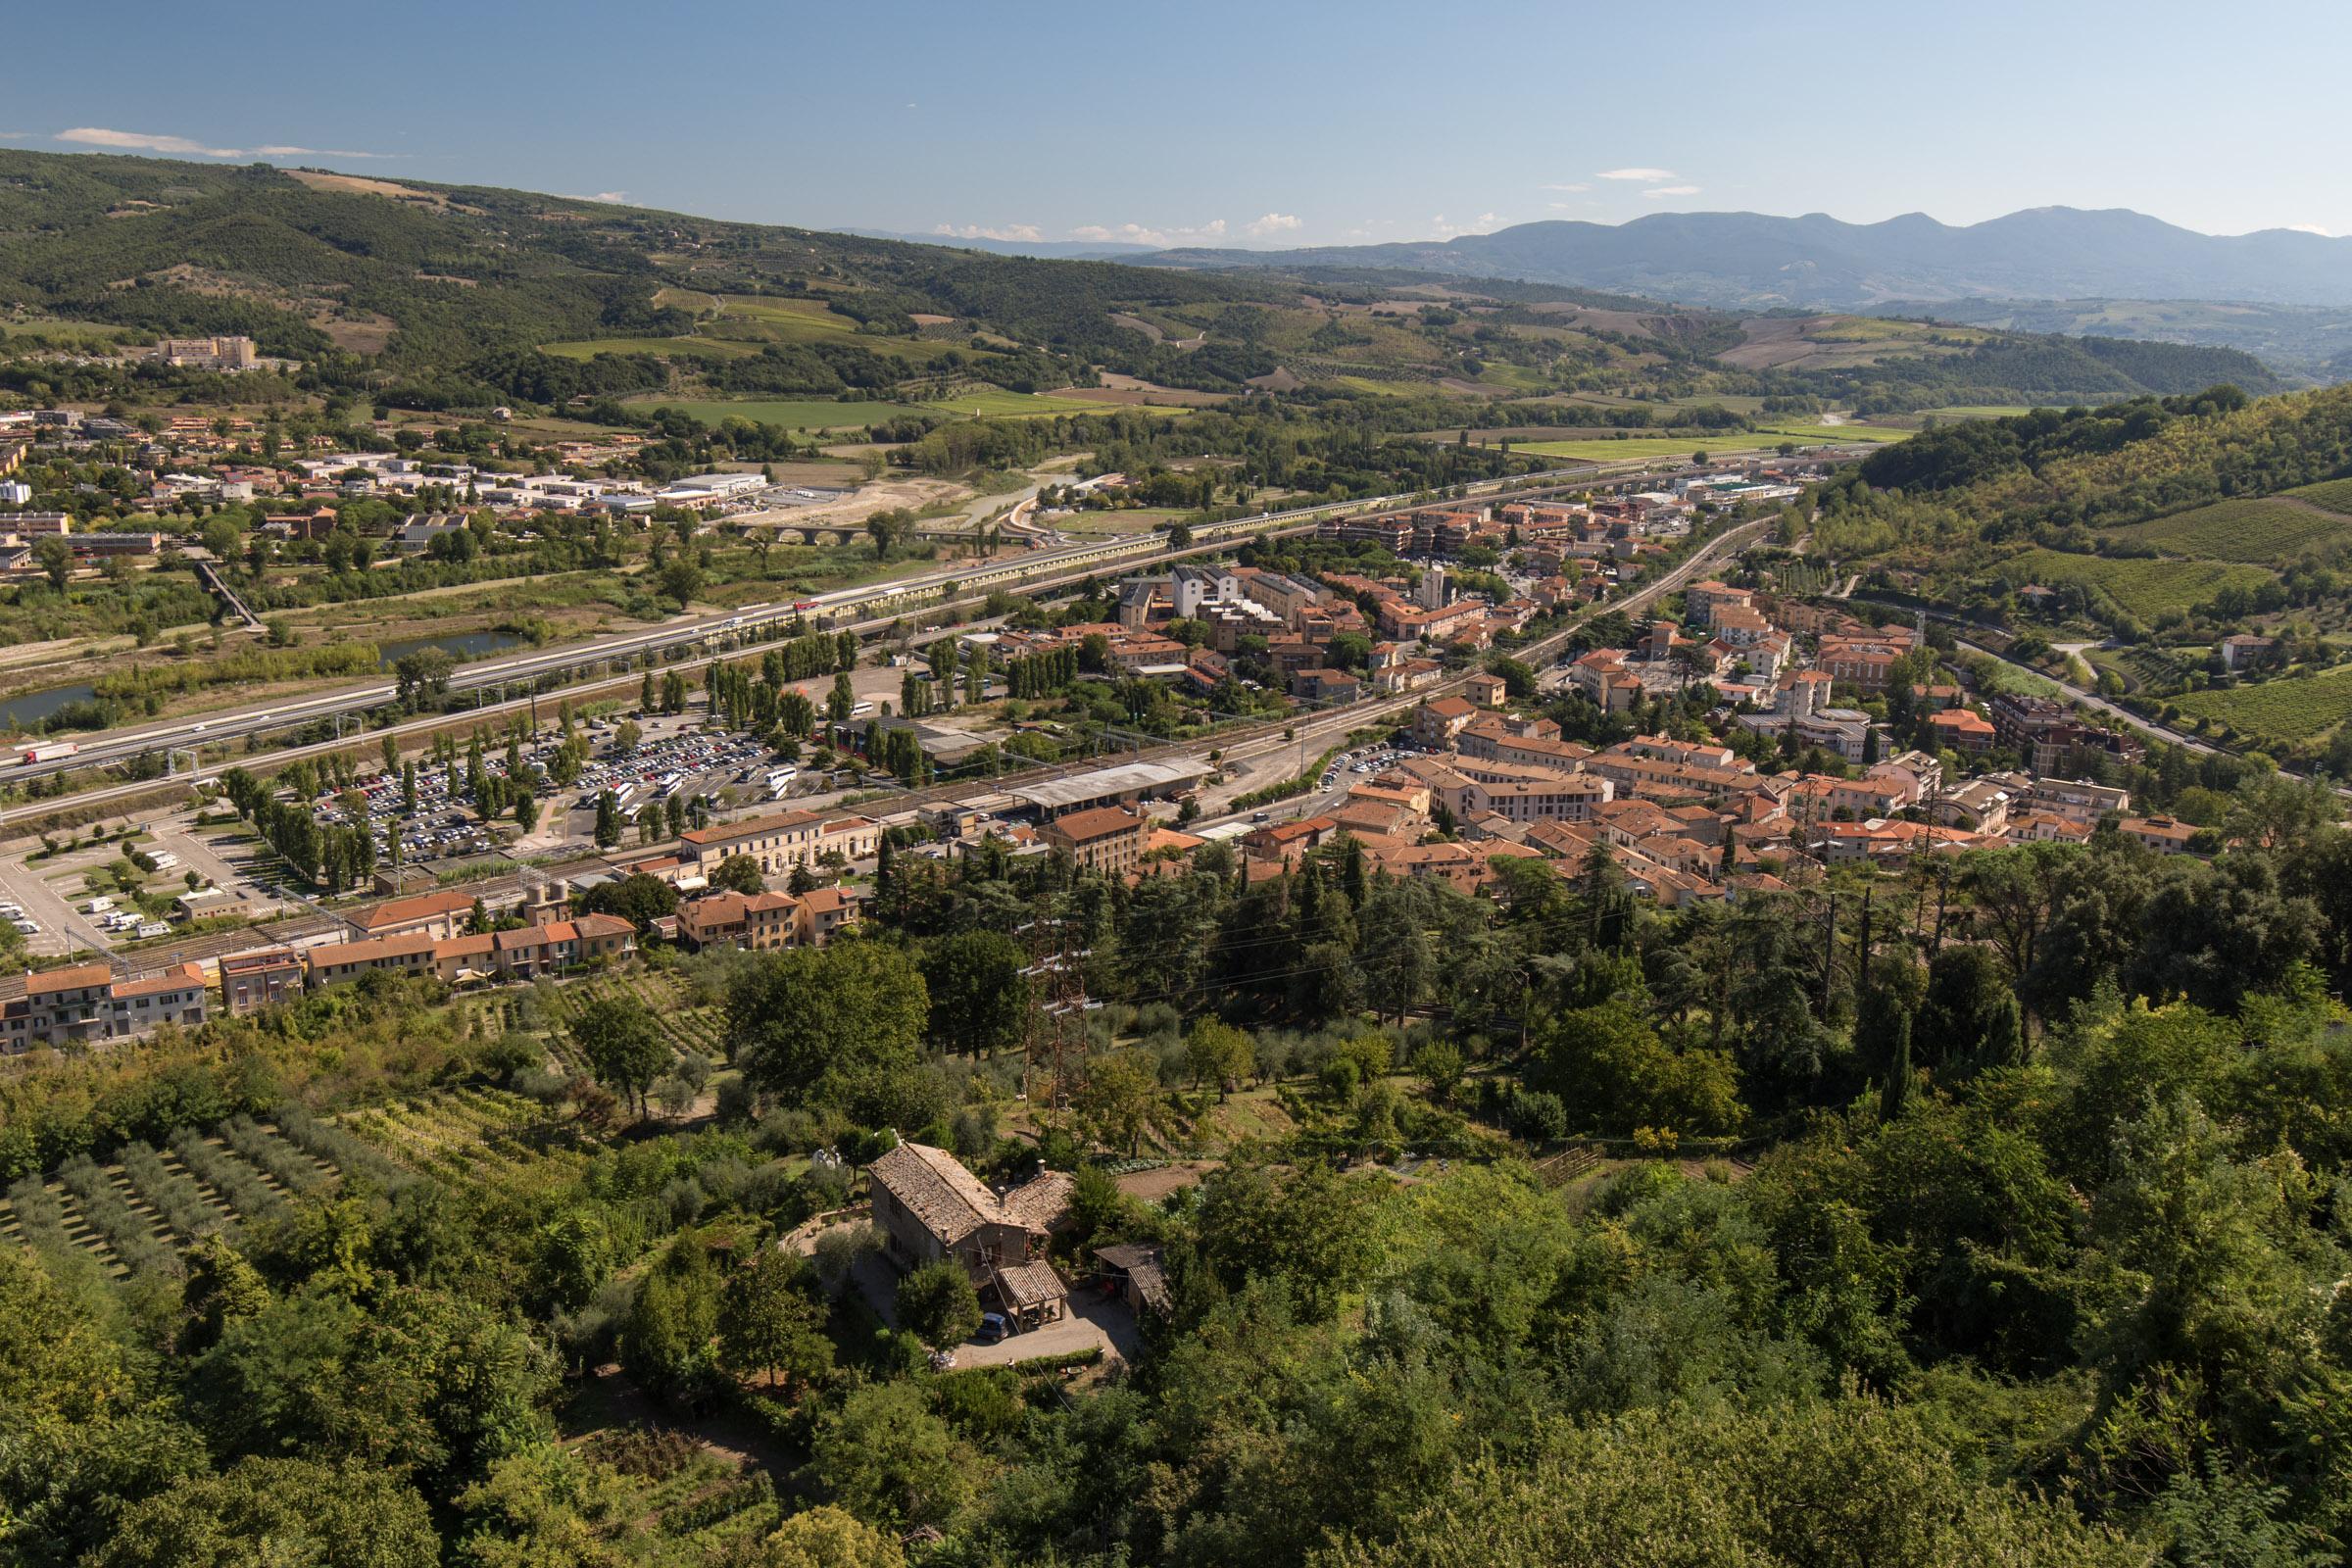 Orvieto, Umbria, Italy | Reid Burchell Photography